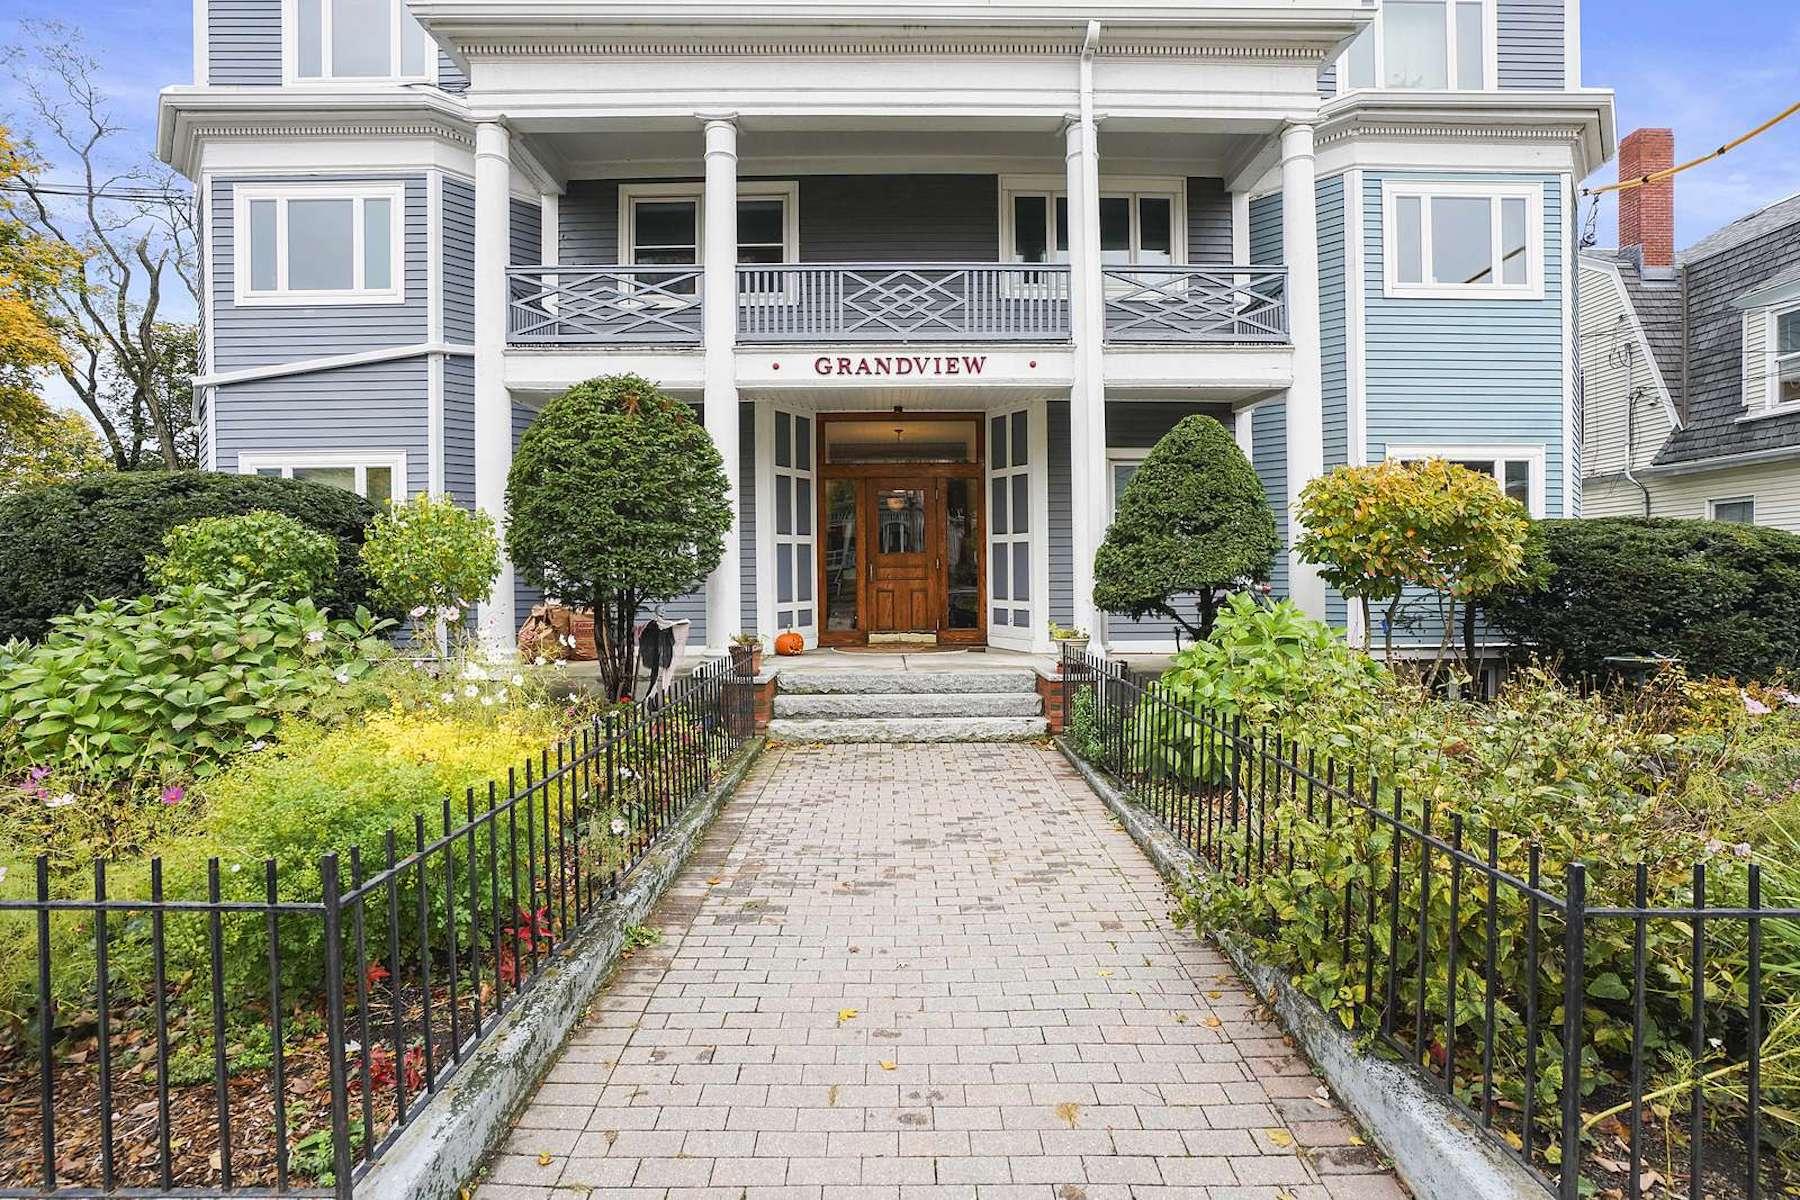 Condominiums 为 销售 在 82 Munroe Street PH1 82 Munroe St PH 1 Somerville, 马萨诸塞州 02143 美国